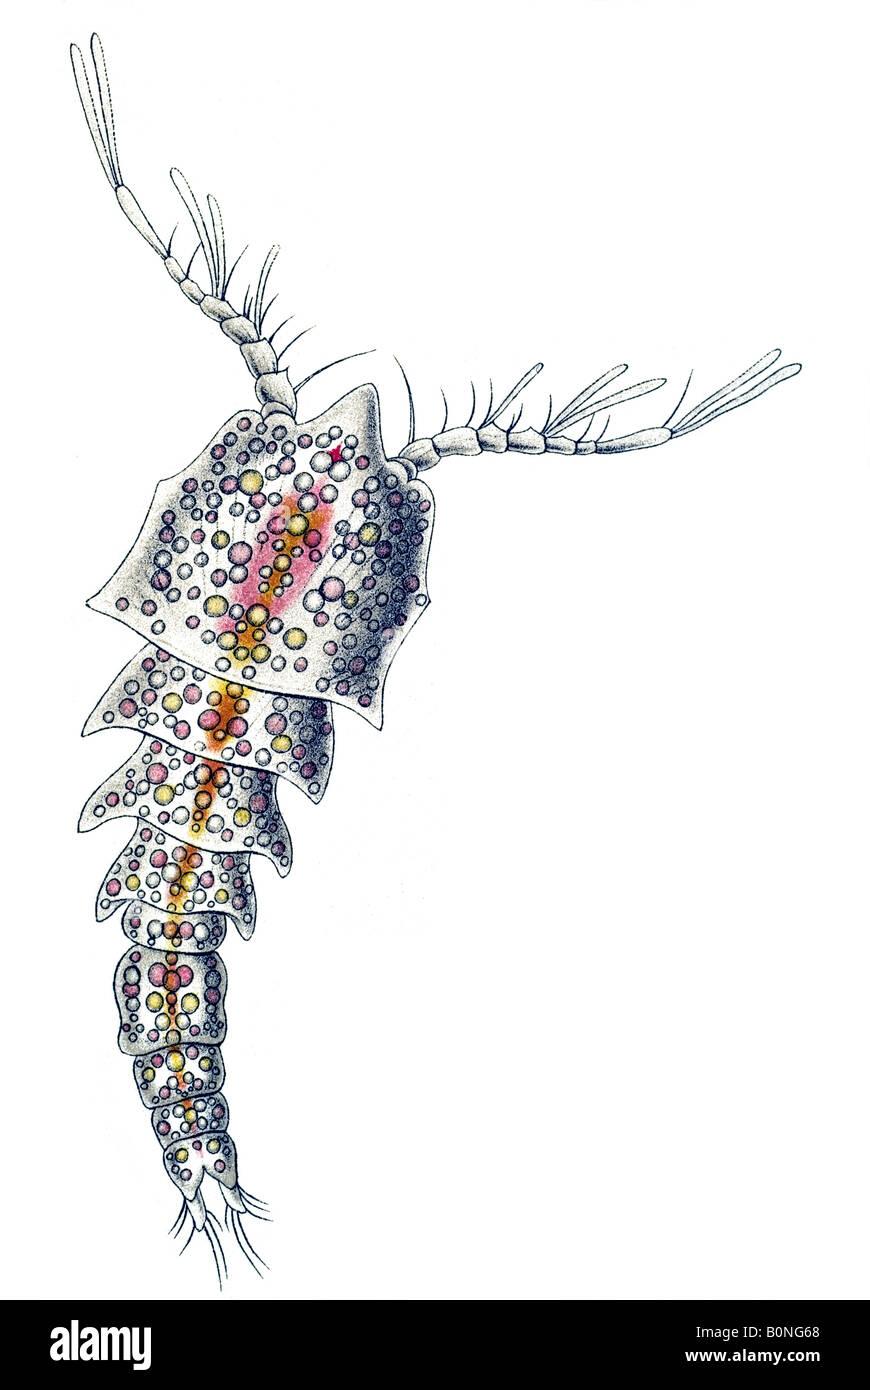 Copepoda Ruderkrebse Name Klytämnestra Scutellata Haeckels Kunstformen der Natur Jugendstil 20th Century Europe Stockbild